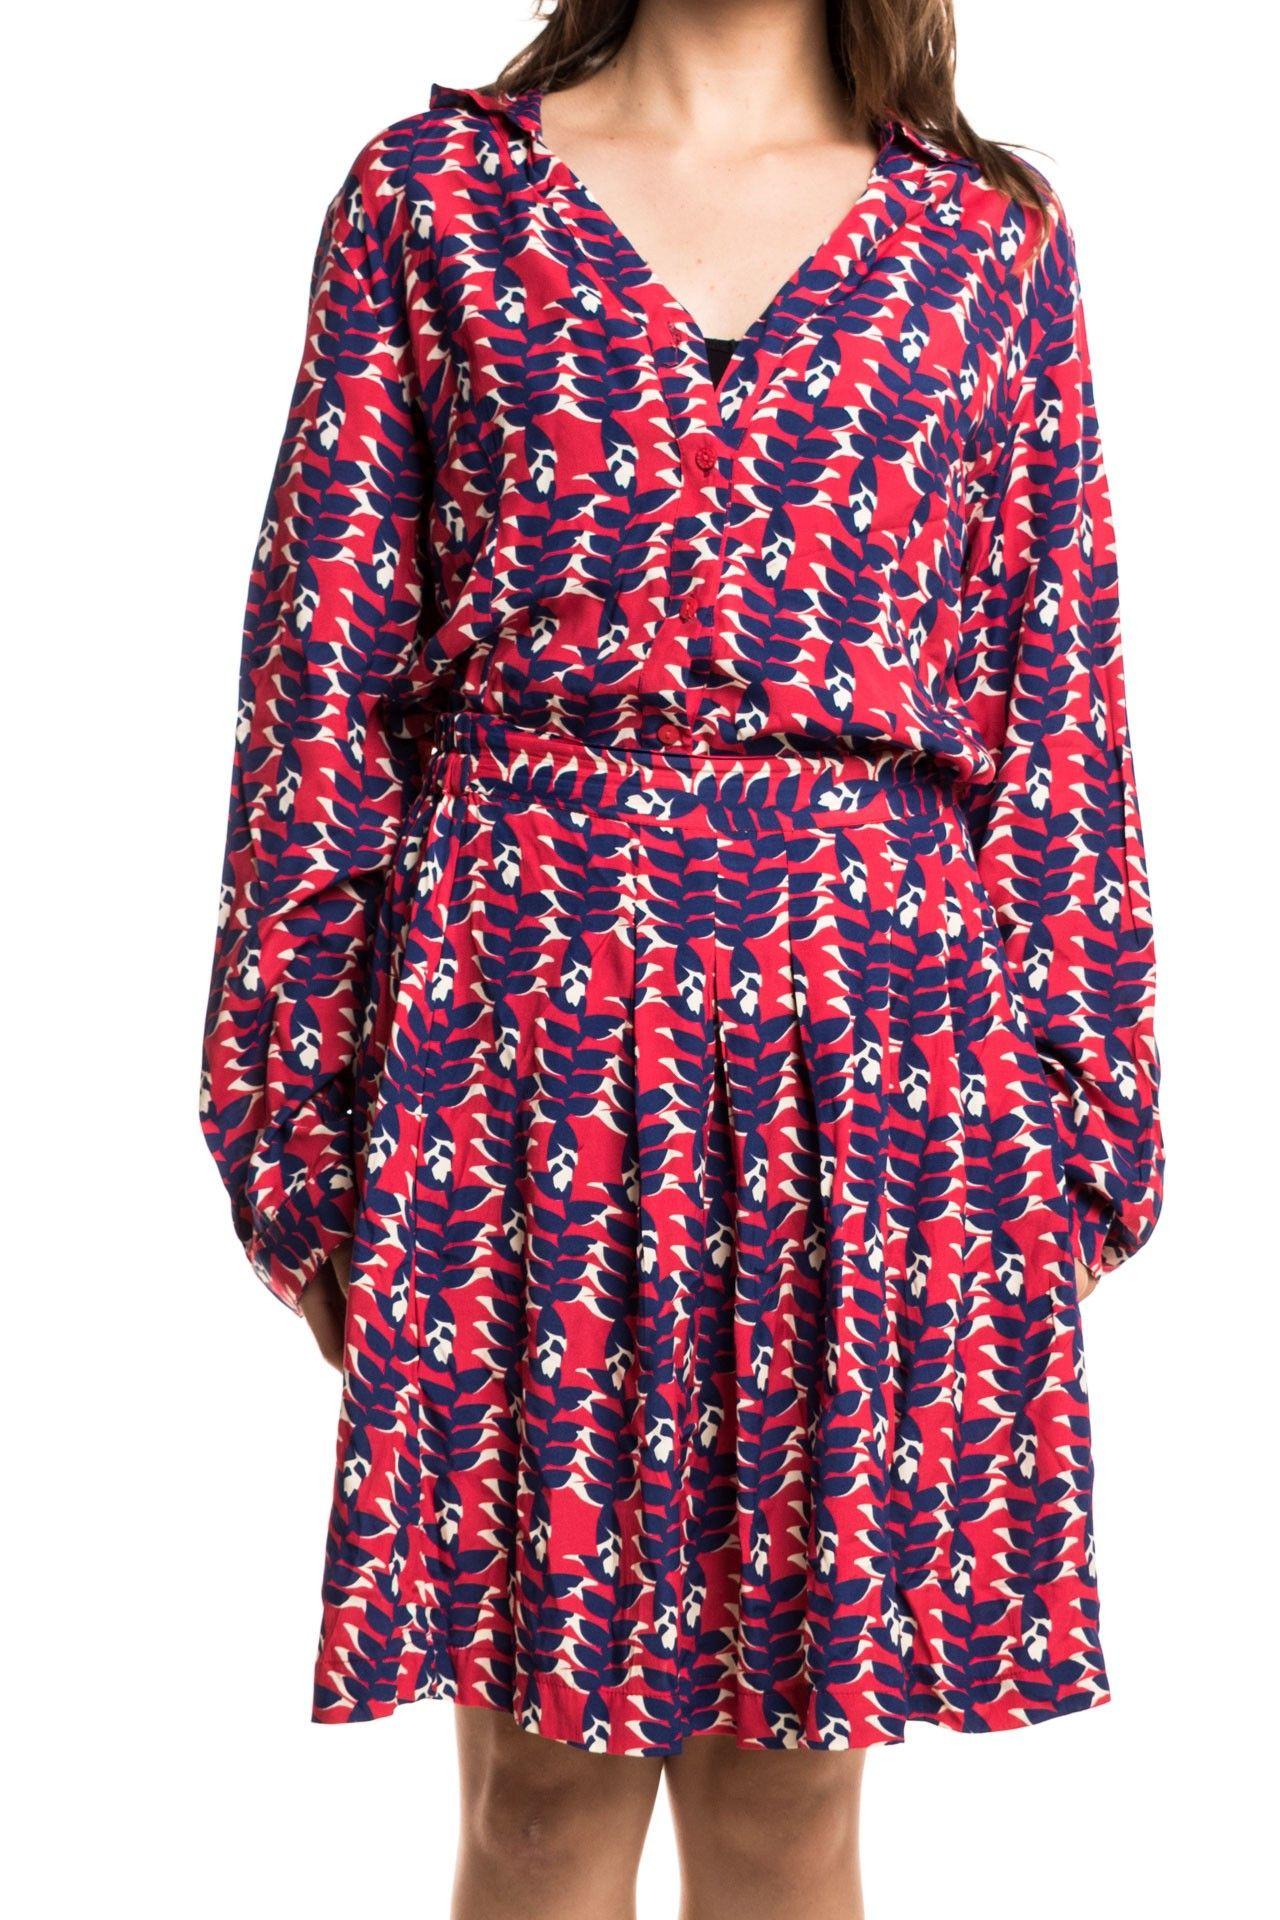 Totem - Conjunto Camisa Saia - Foto 1